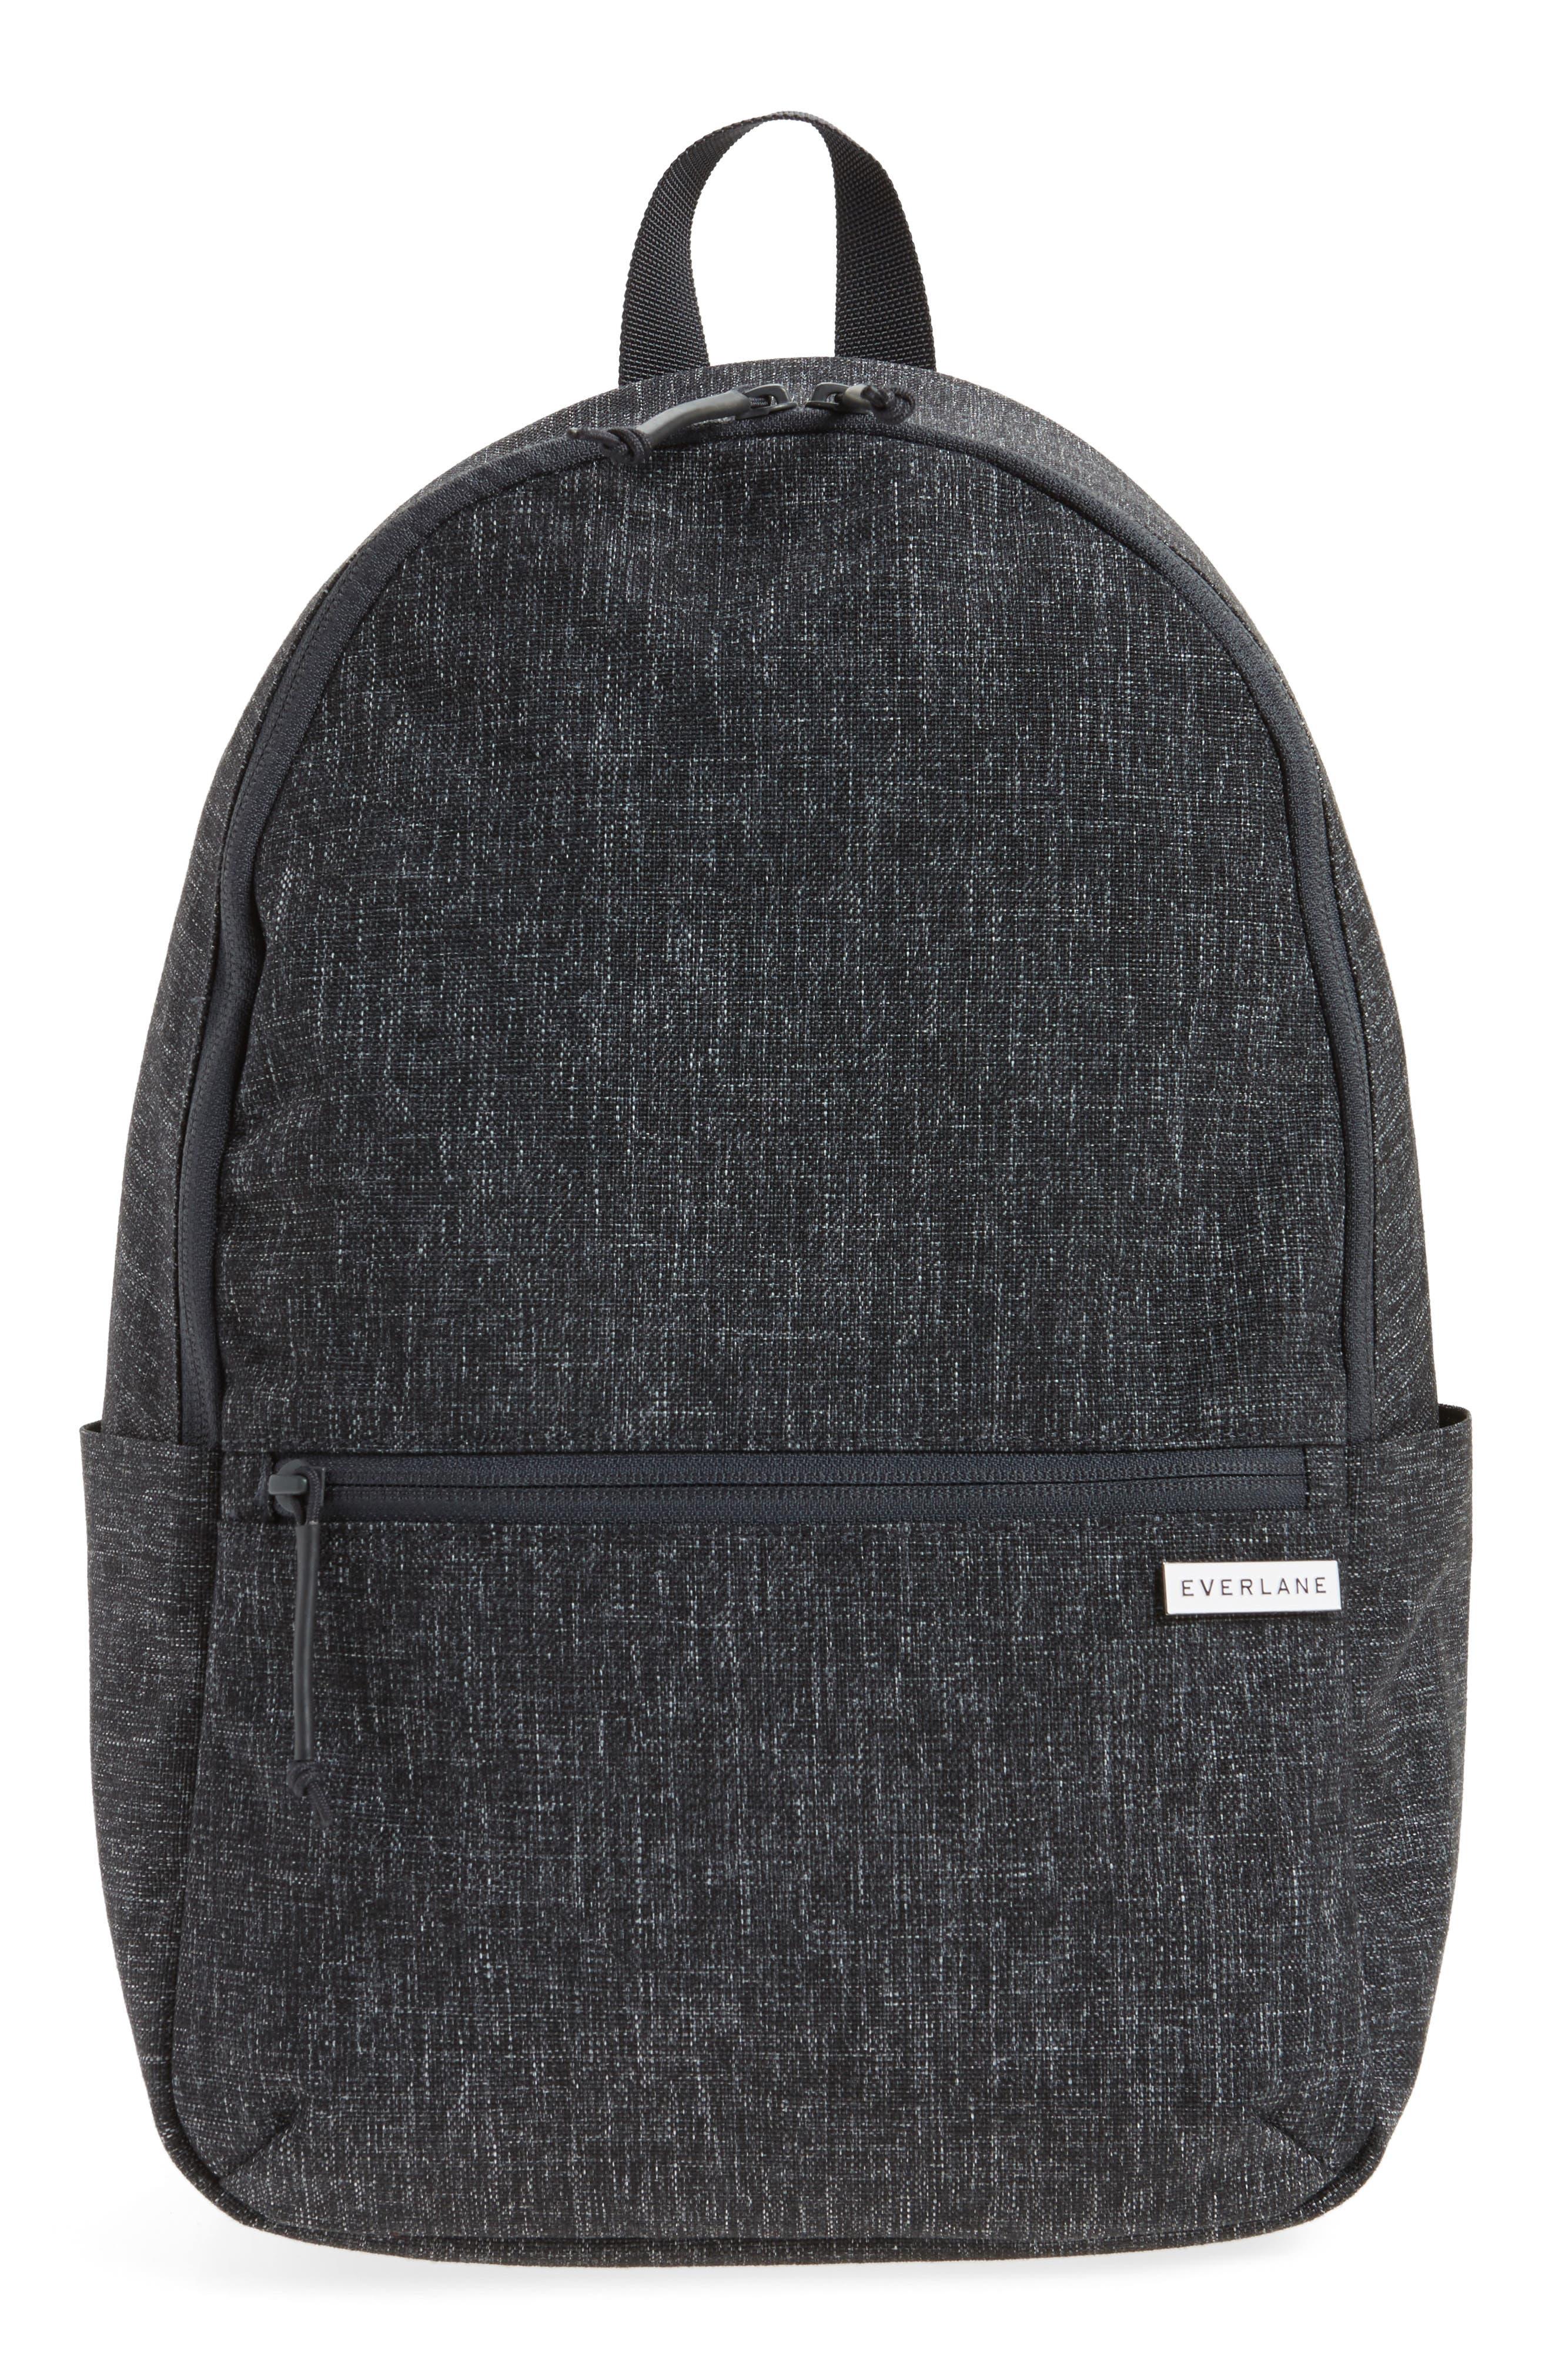 Everlane The Small Street Nylon Zip Backpack